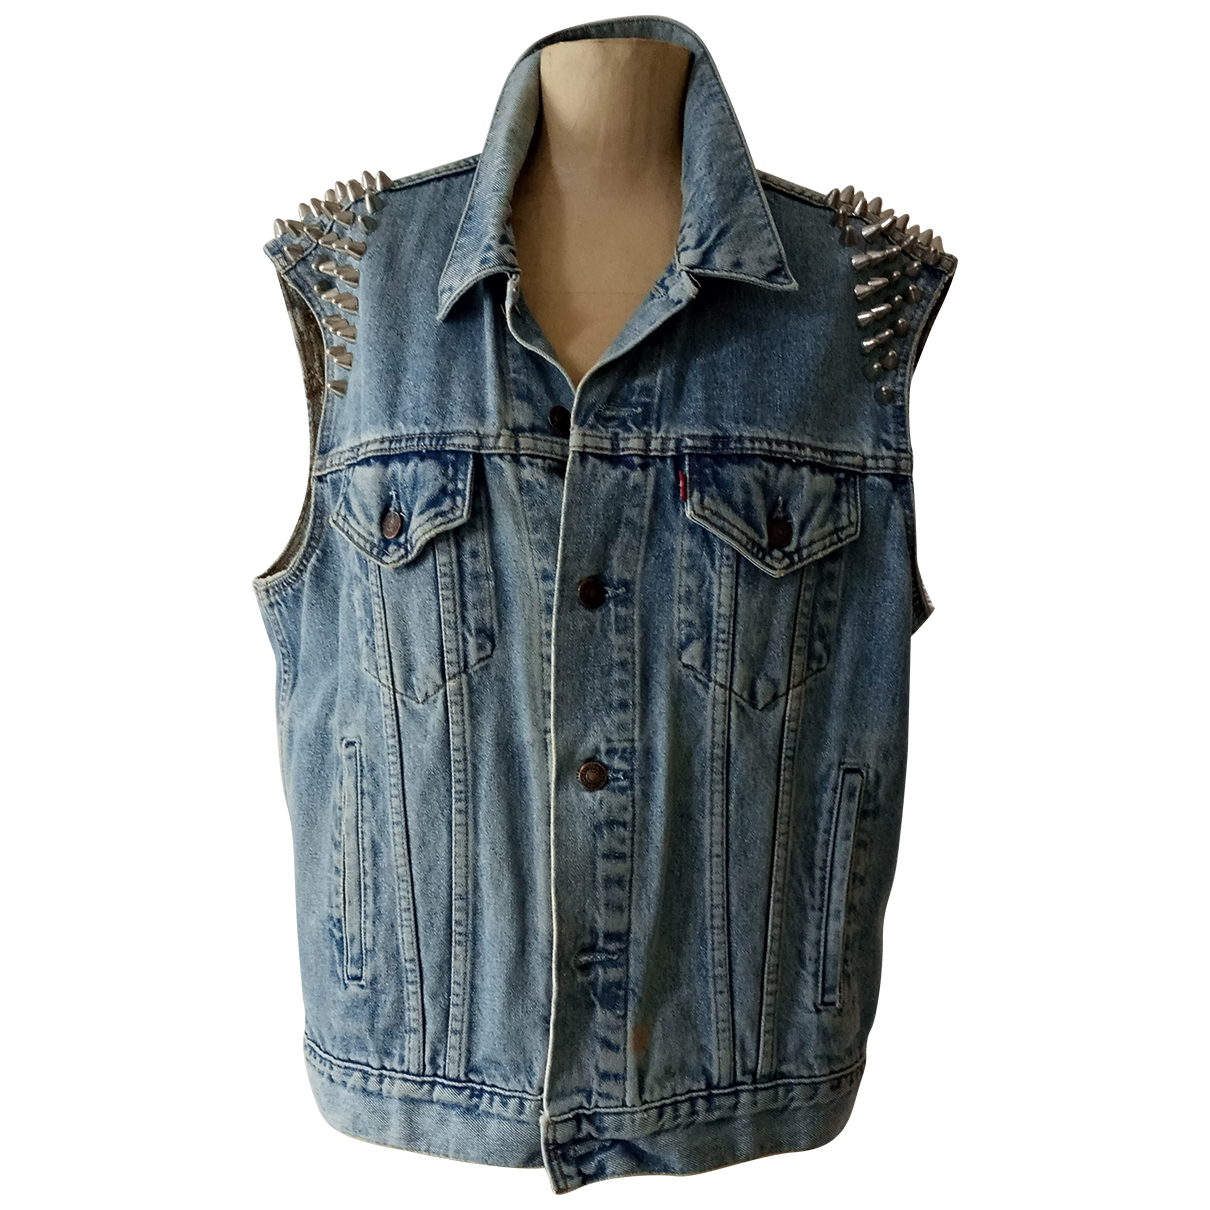 Chaqueta Levi's Vintage Clothing